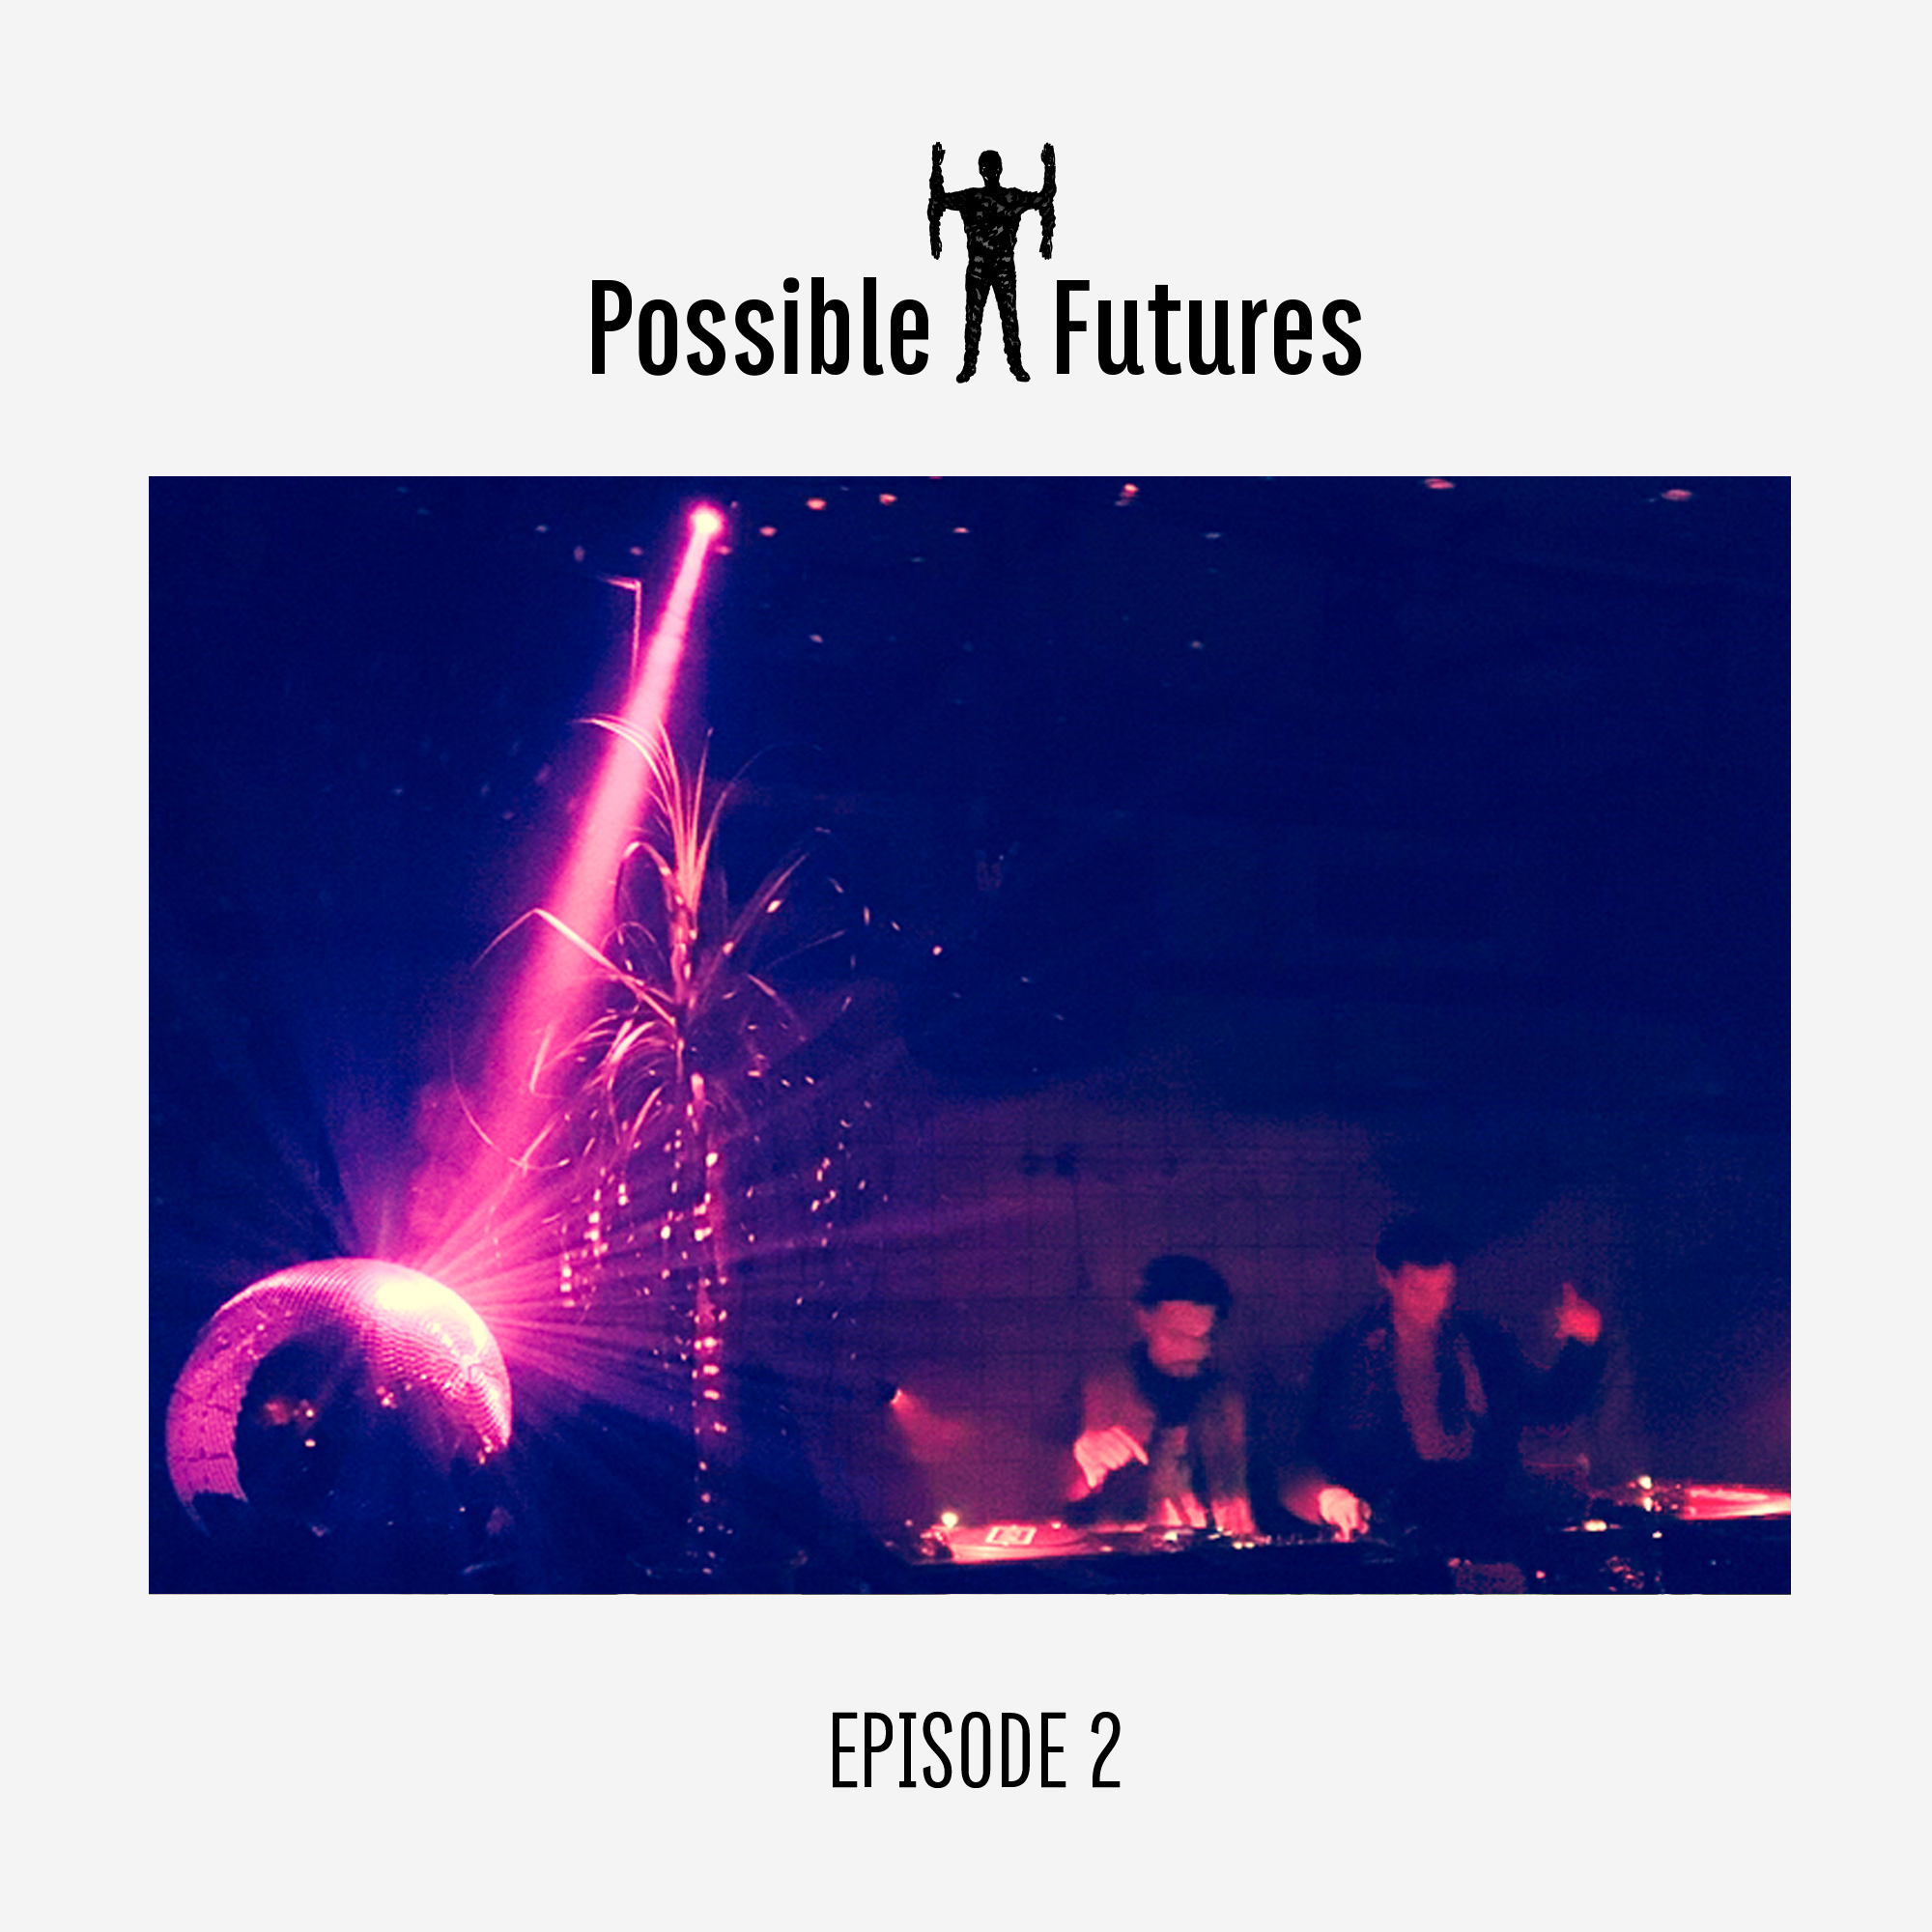 possiblefuturesradio_episode2.png